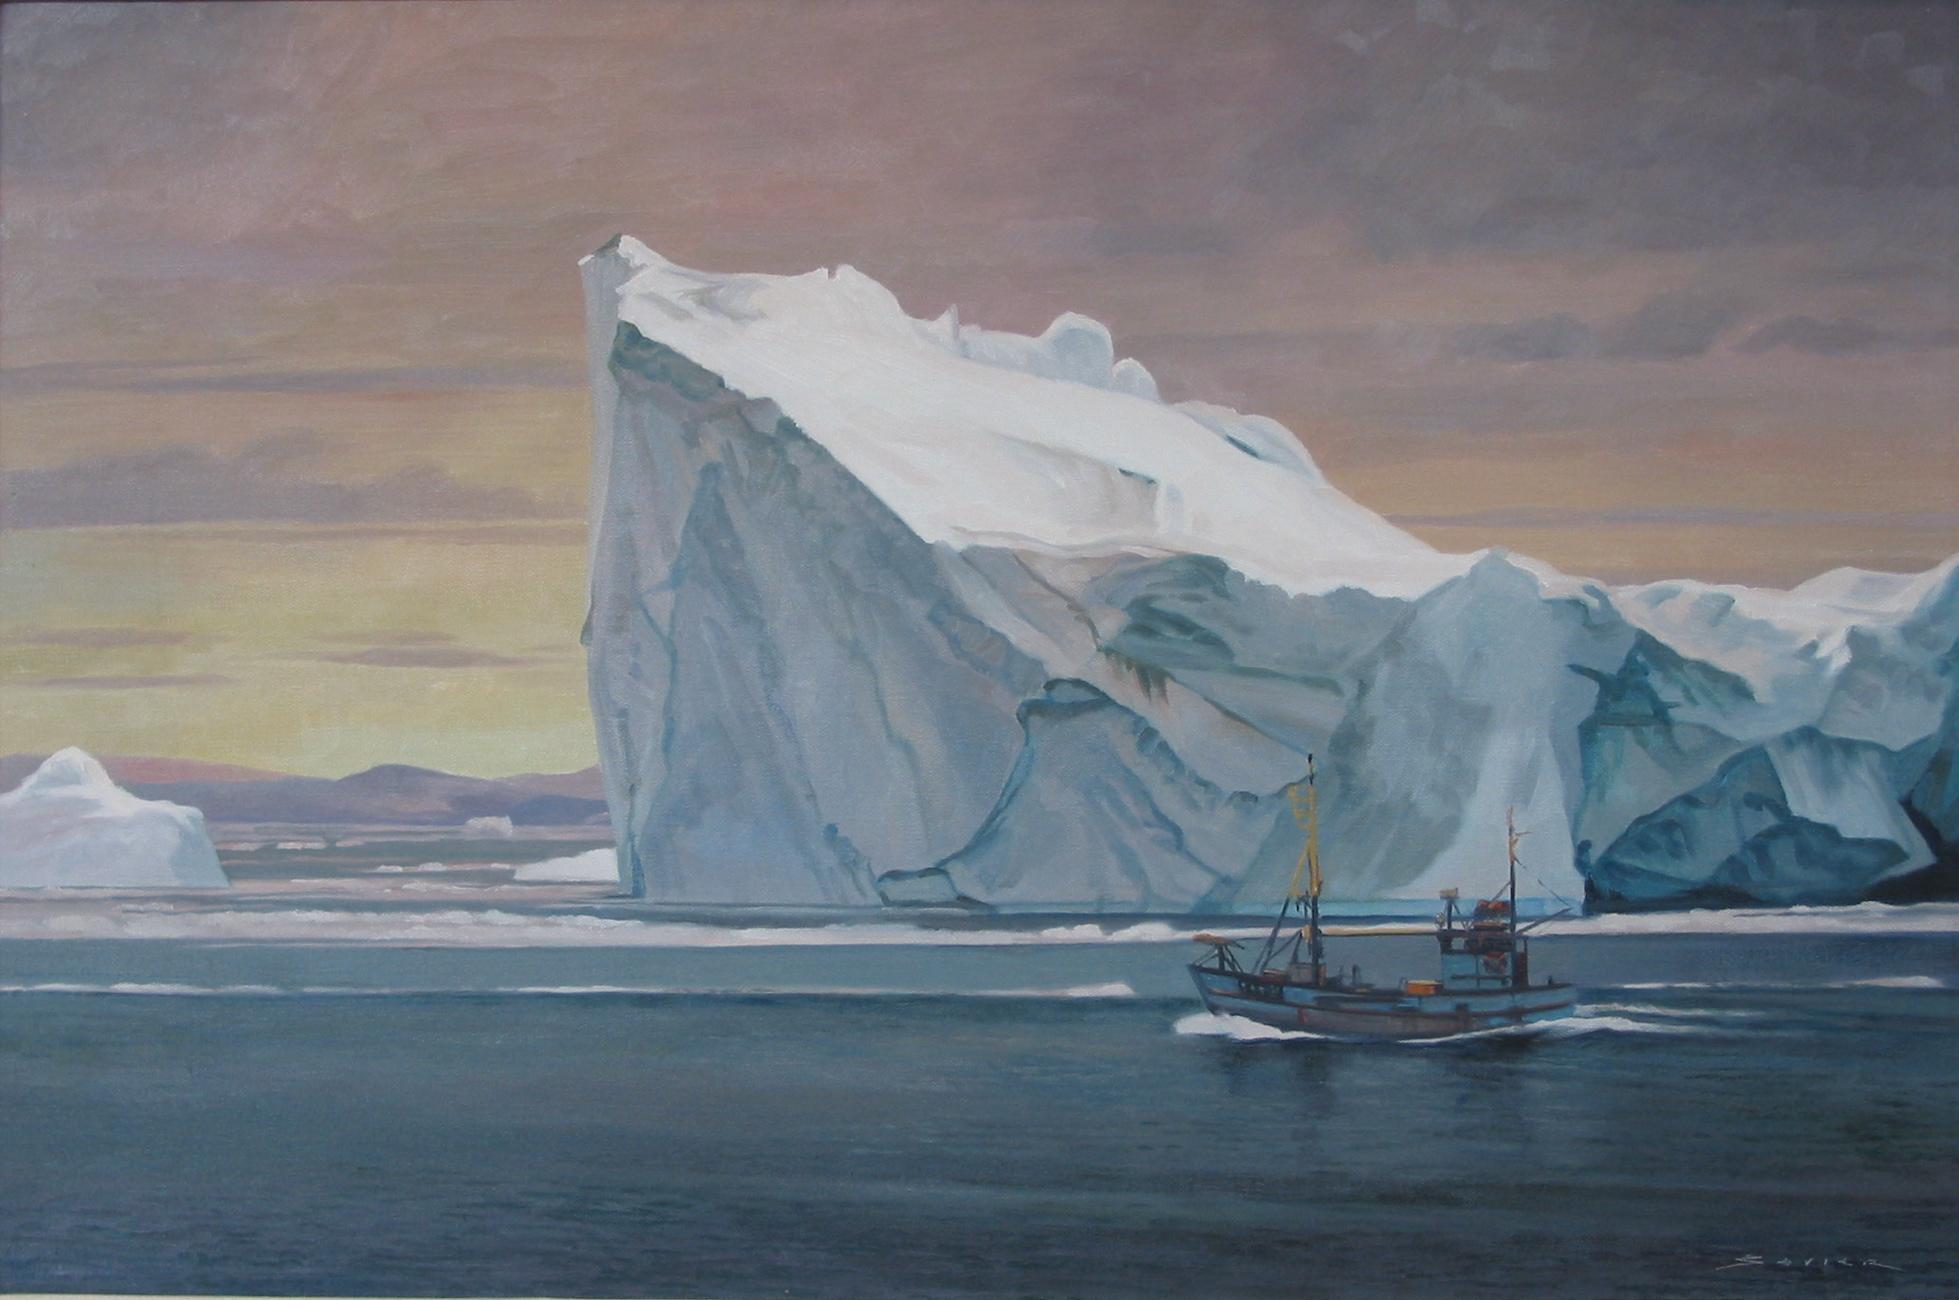 Disko Bay/Greenland, 24 x 30, oil